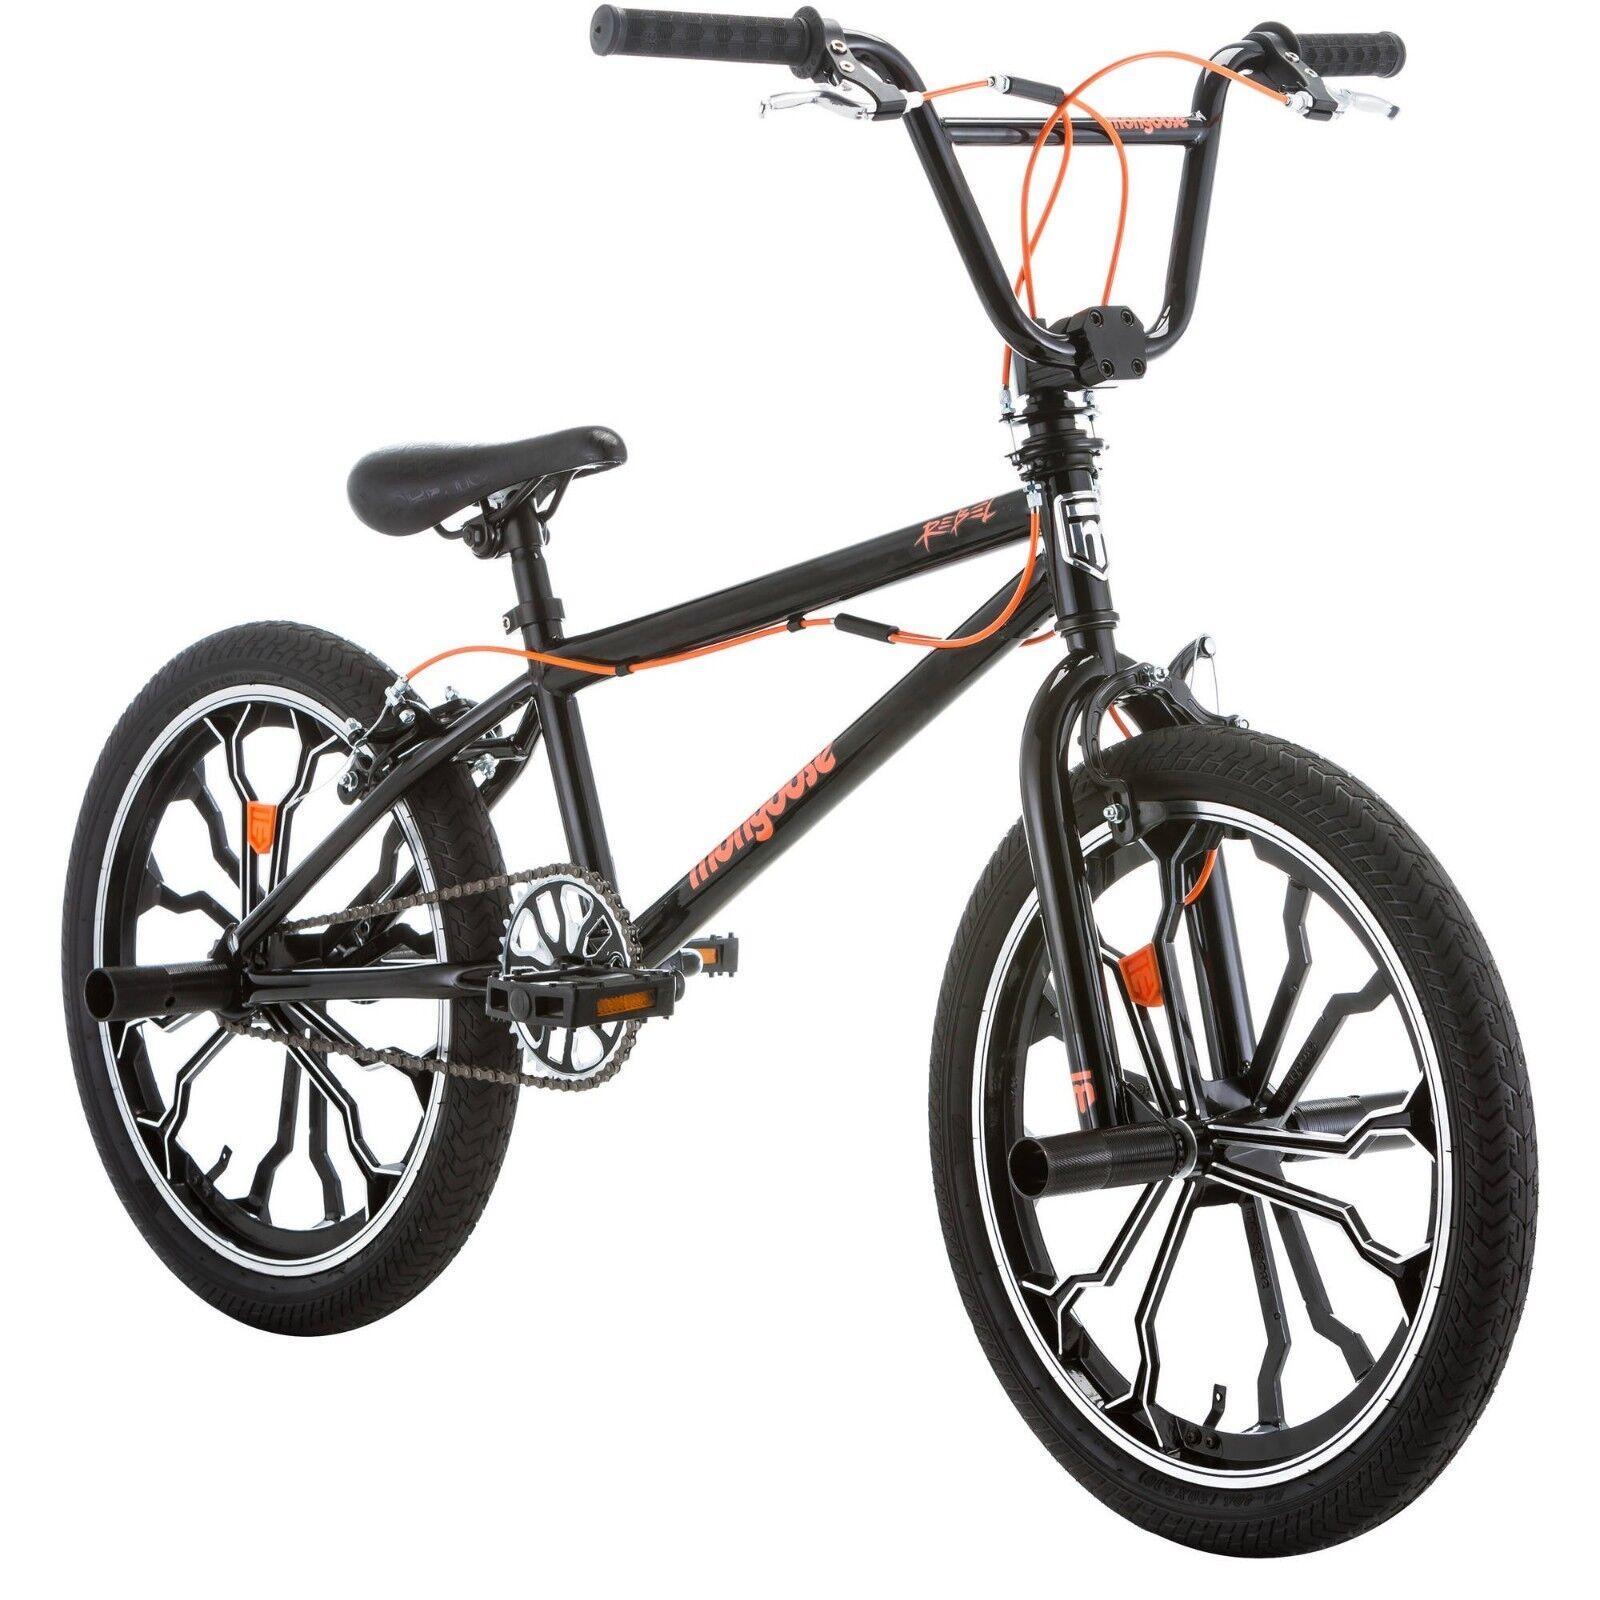 Kids BMX Bike Mongoose Freestyle Youth Bikes For Boys Kid Bicycle 20 Inch Black